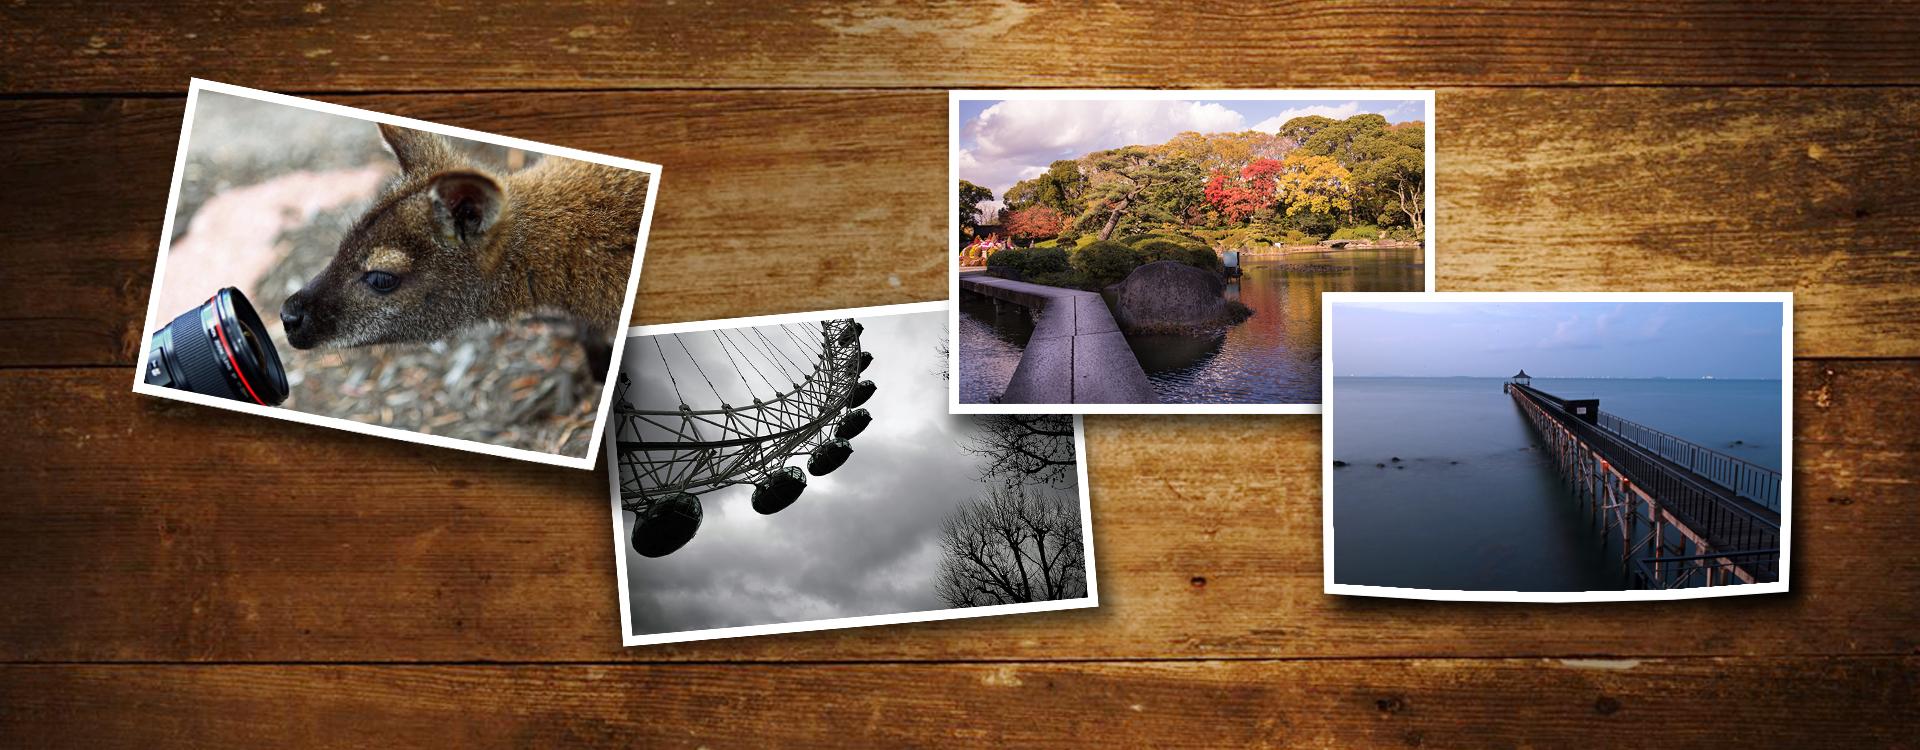 Canon Image Gateway - Canon India